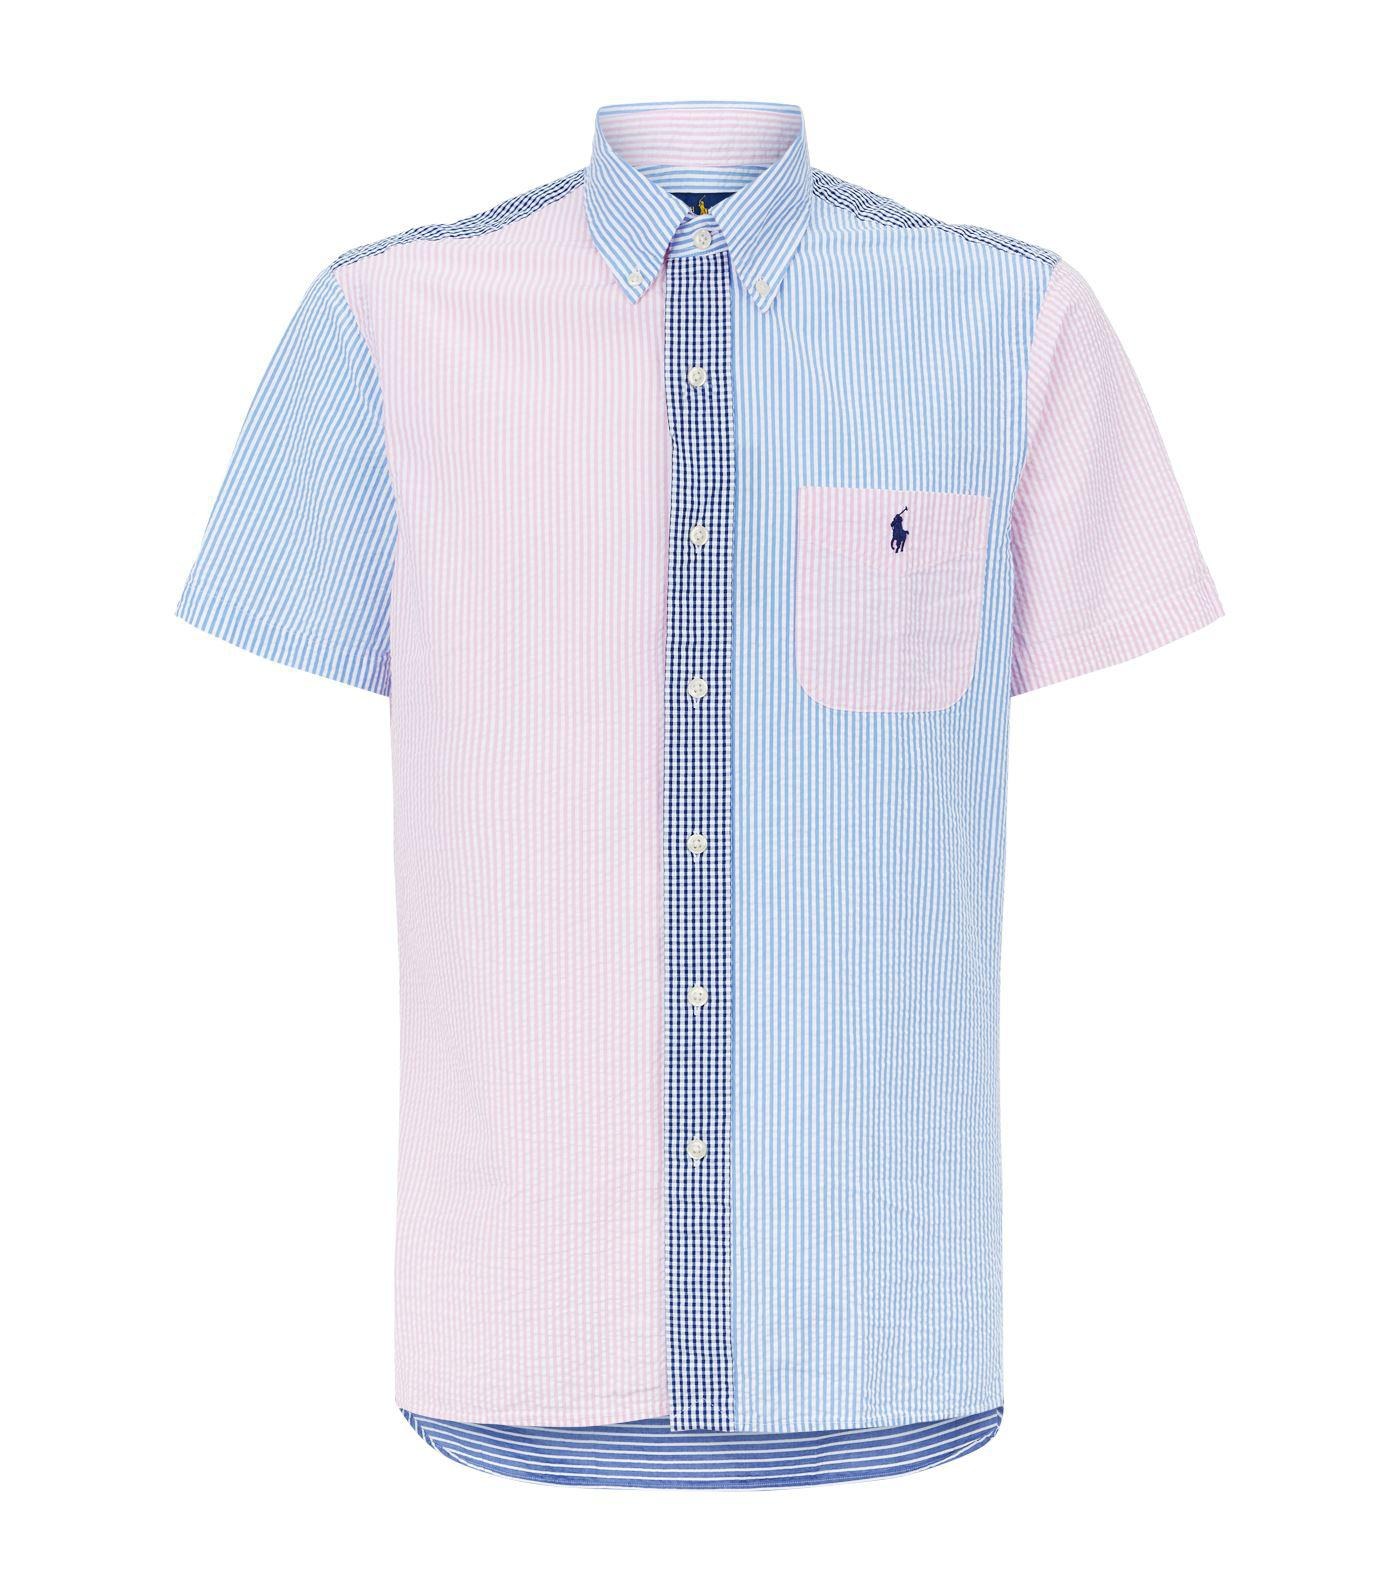 Polo Ralph Lauren Cotton Patchwork Seersucker Shirt In Blue For